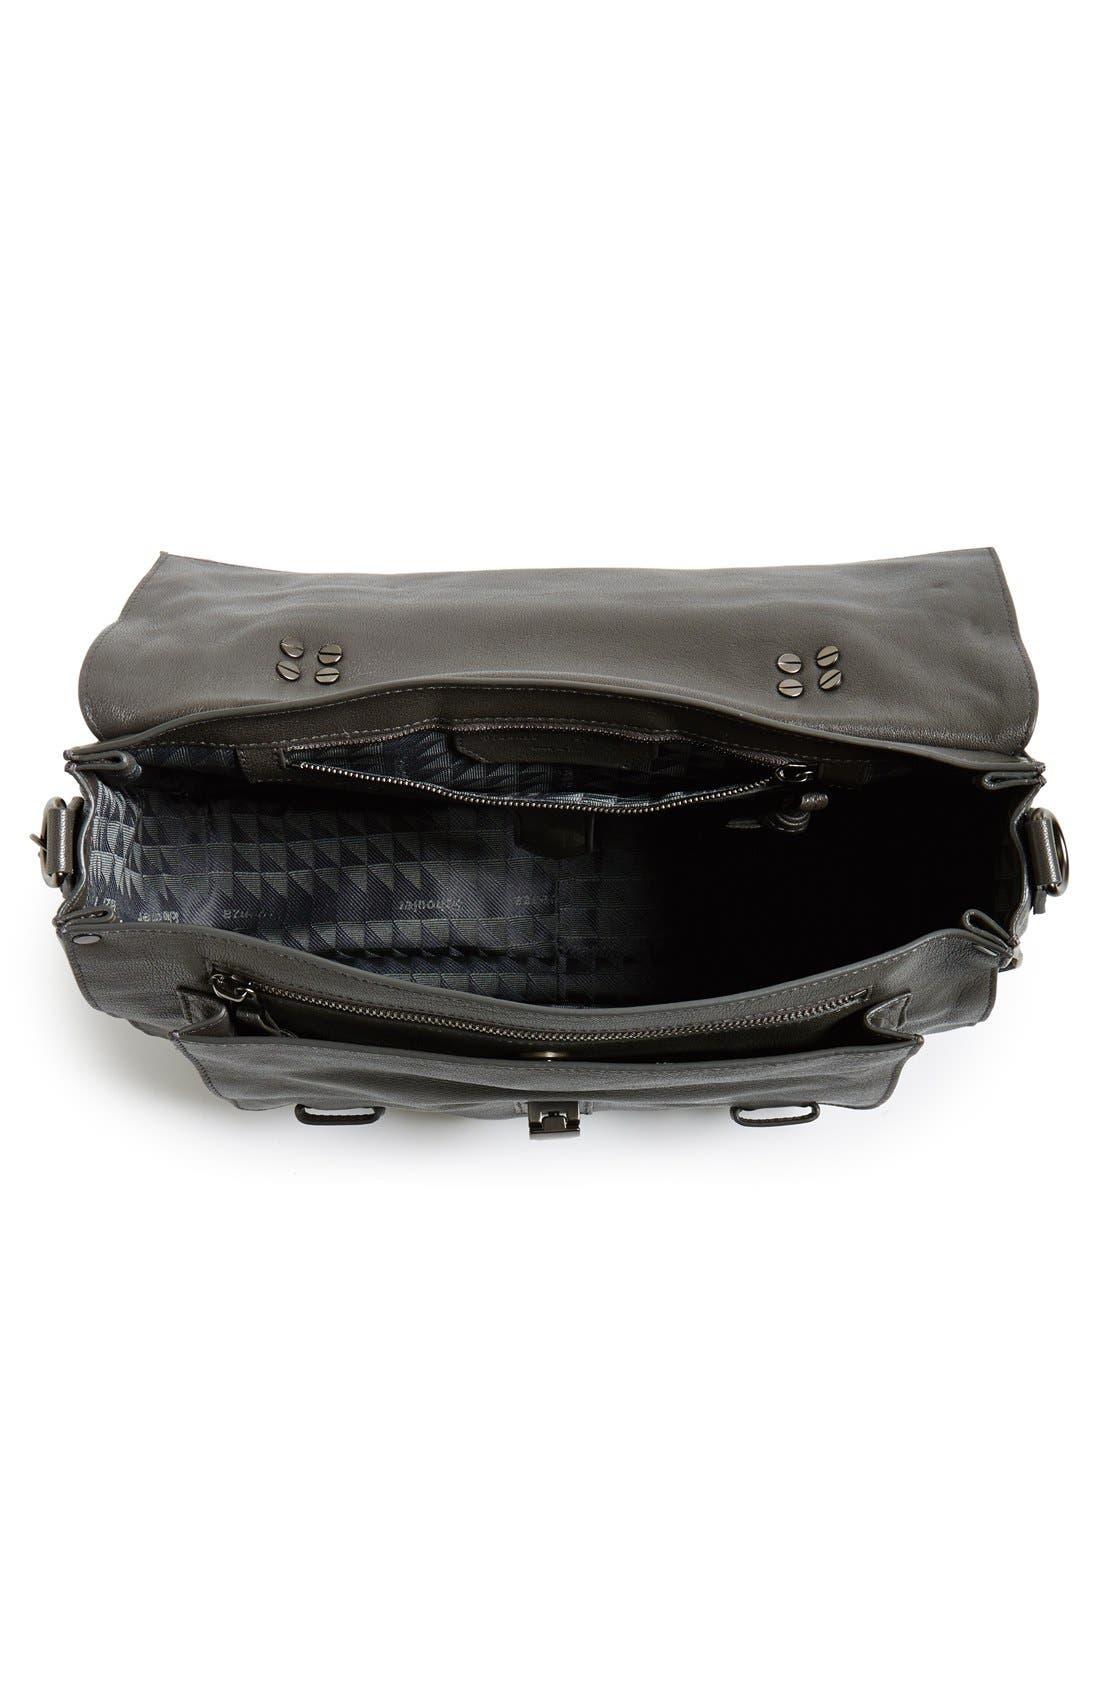 Alternate Image 2  - Proenza Schouler 'Medium PS1' Fringed Leather Satchel